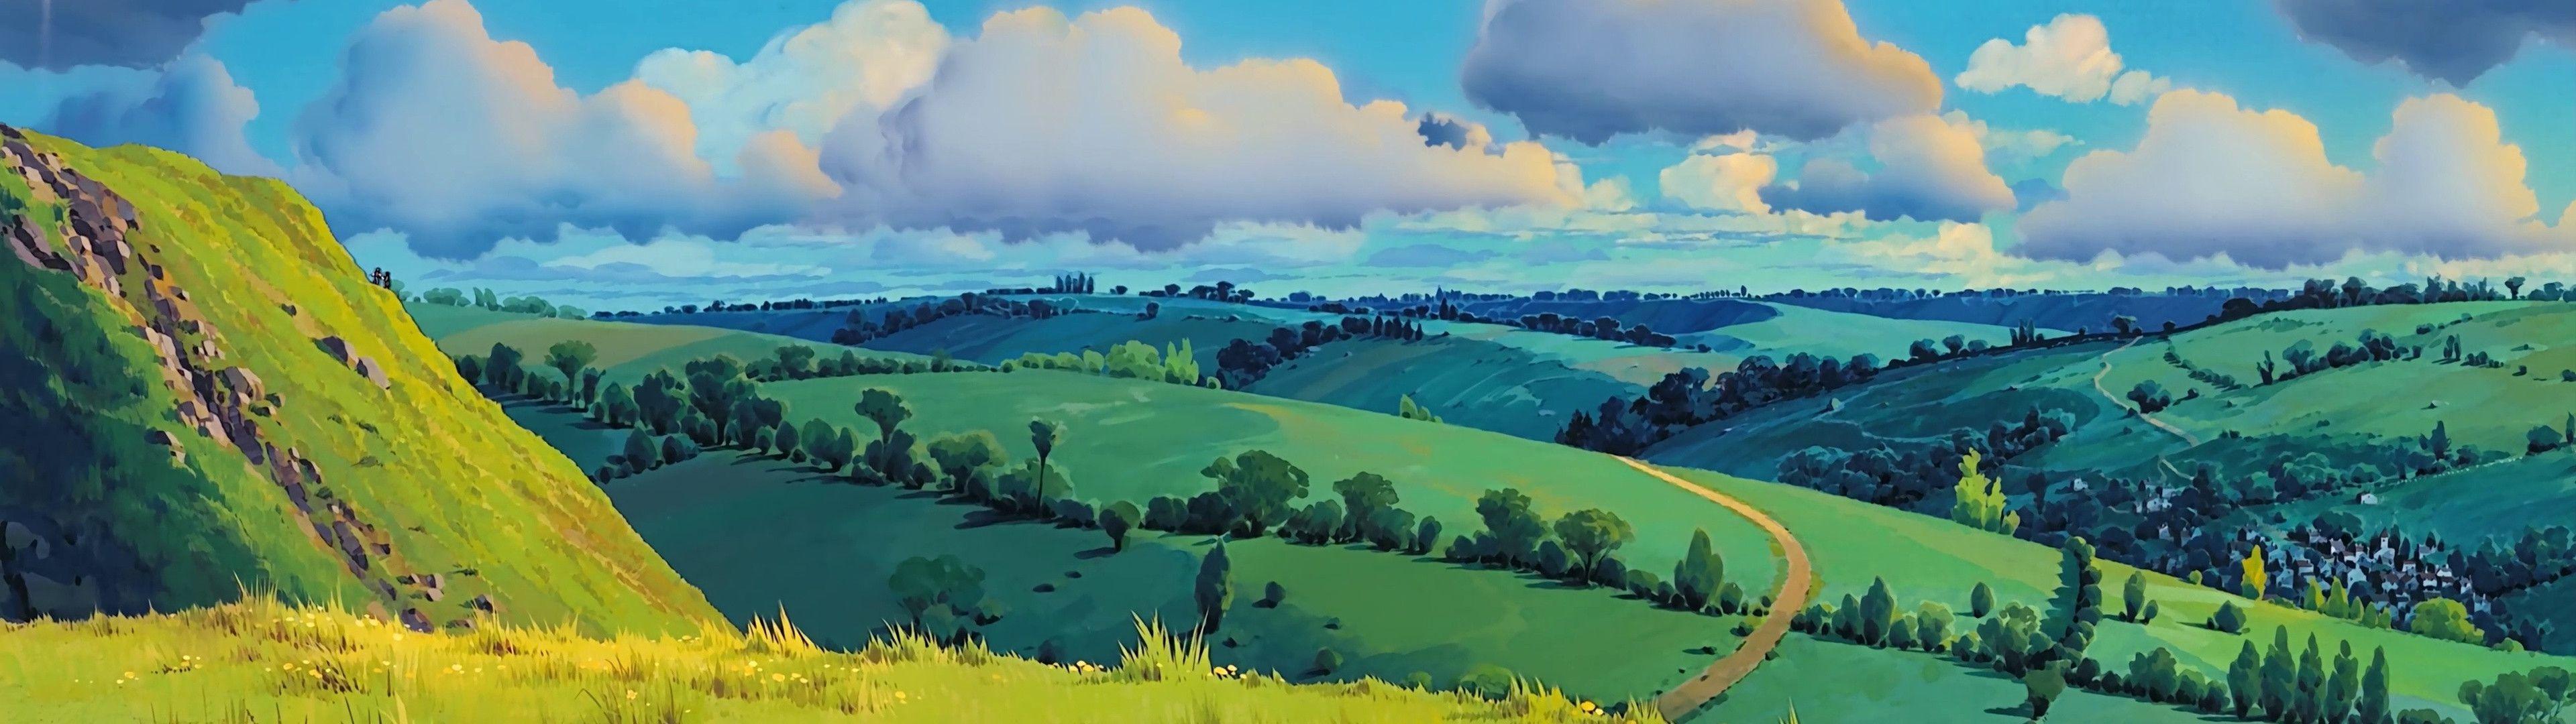 Studio Ghibli 3840 X 1080 Wallpapers - Top Free Studio ...